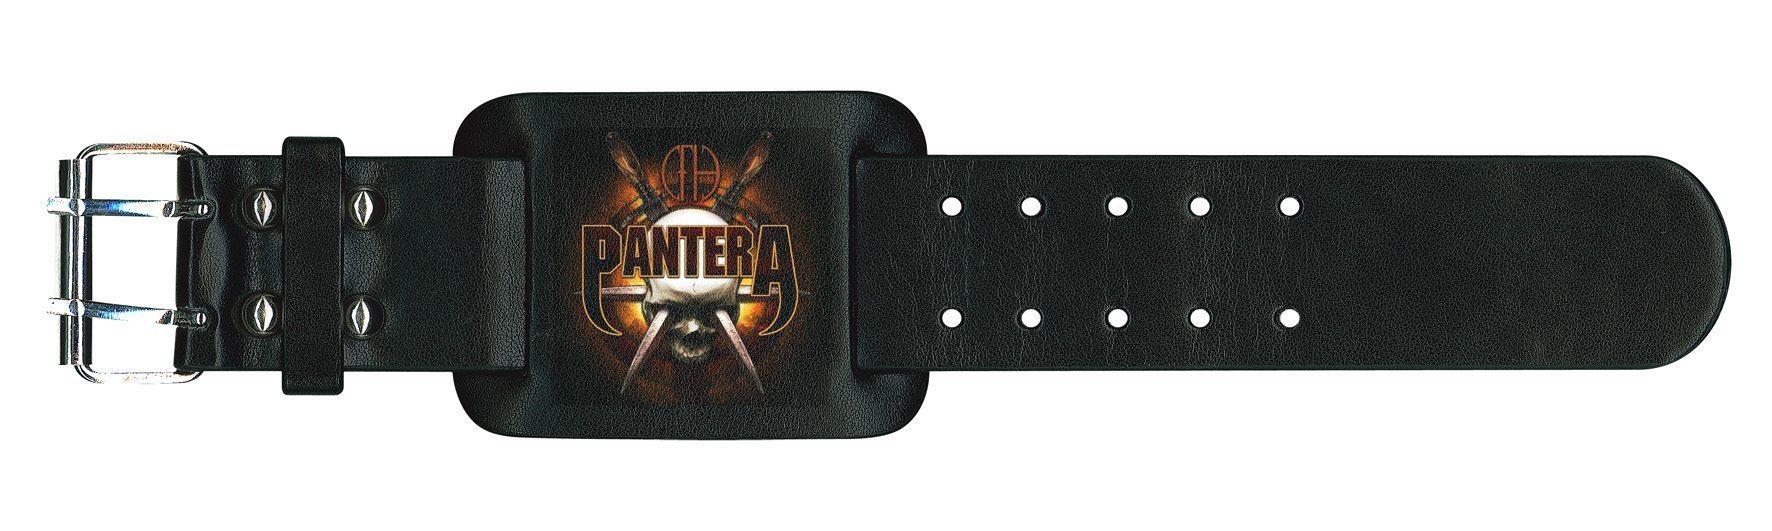 Pantera Leather Wristband Skull Knives